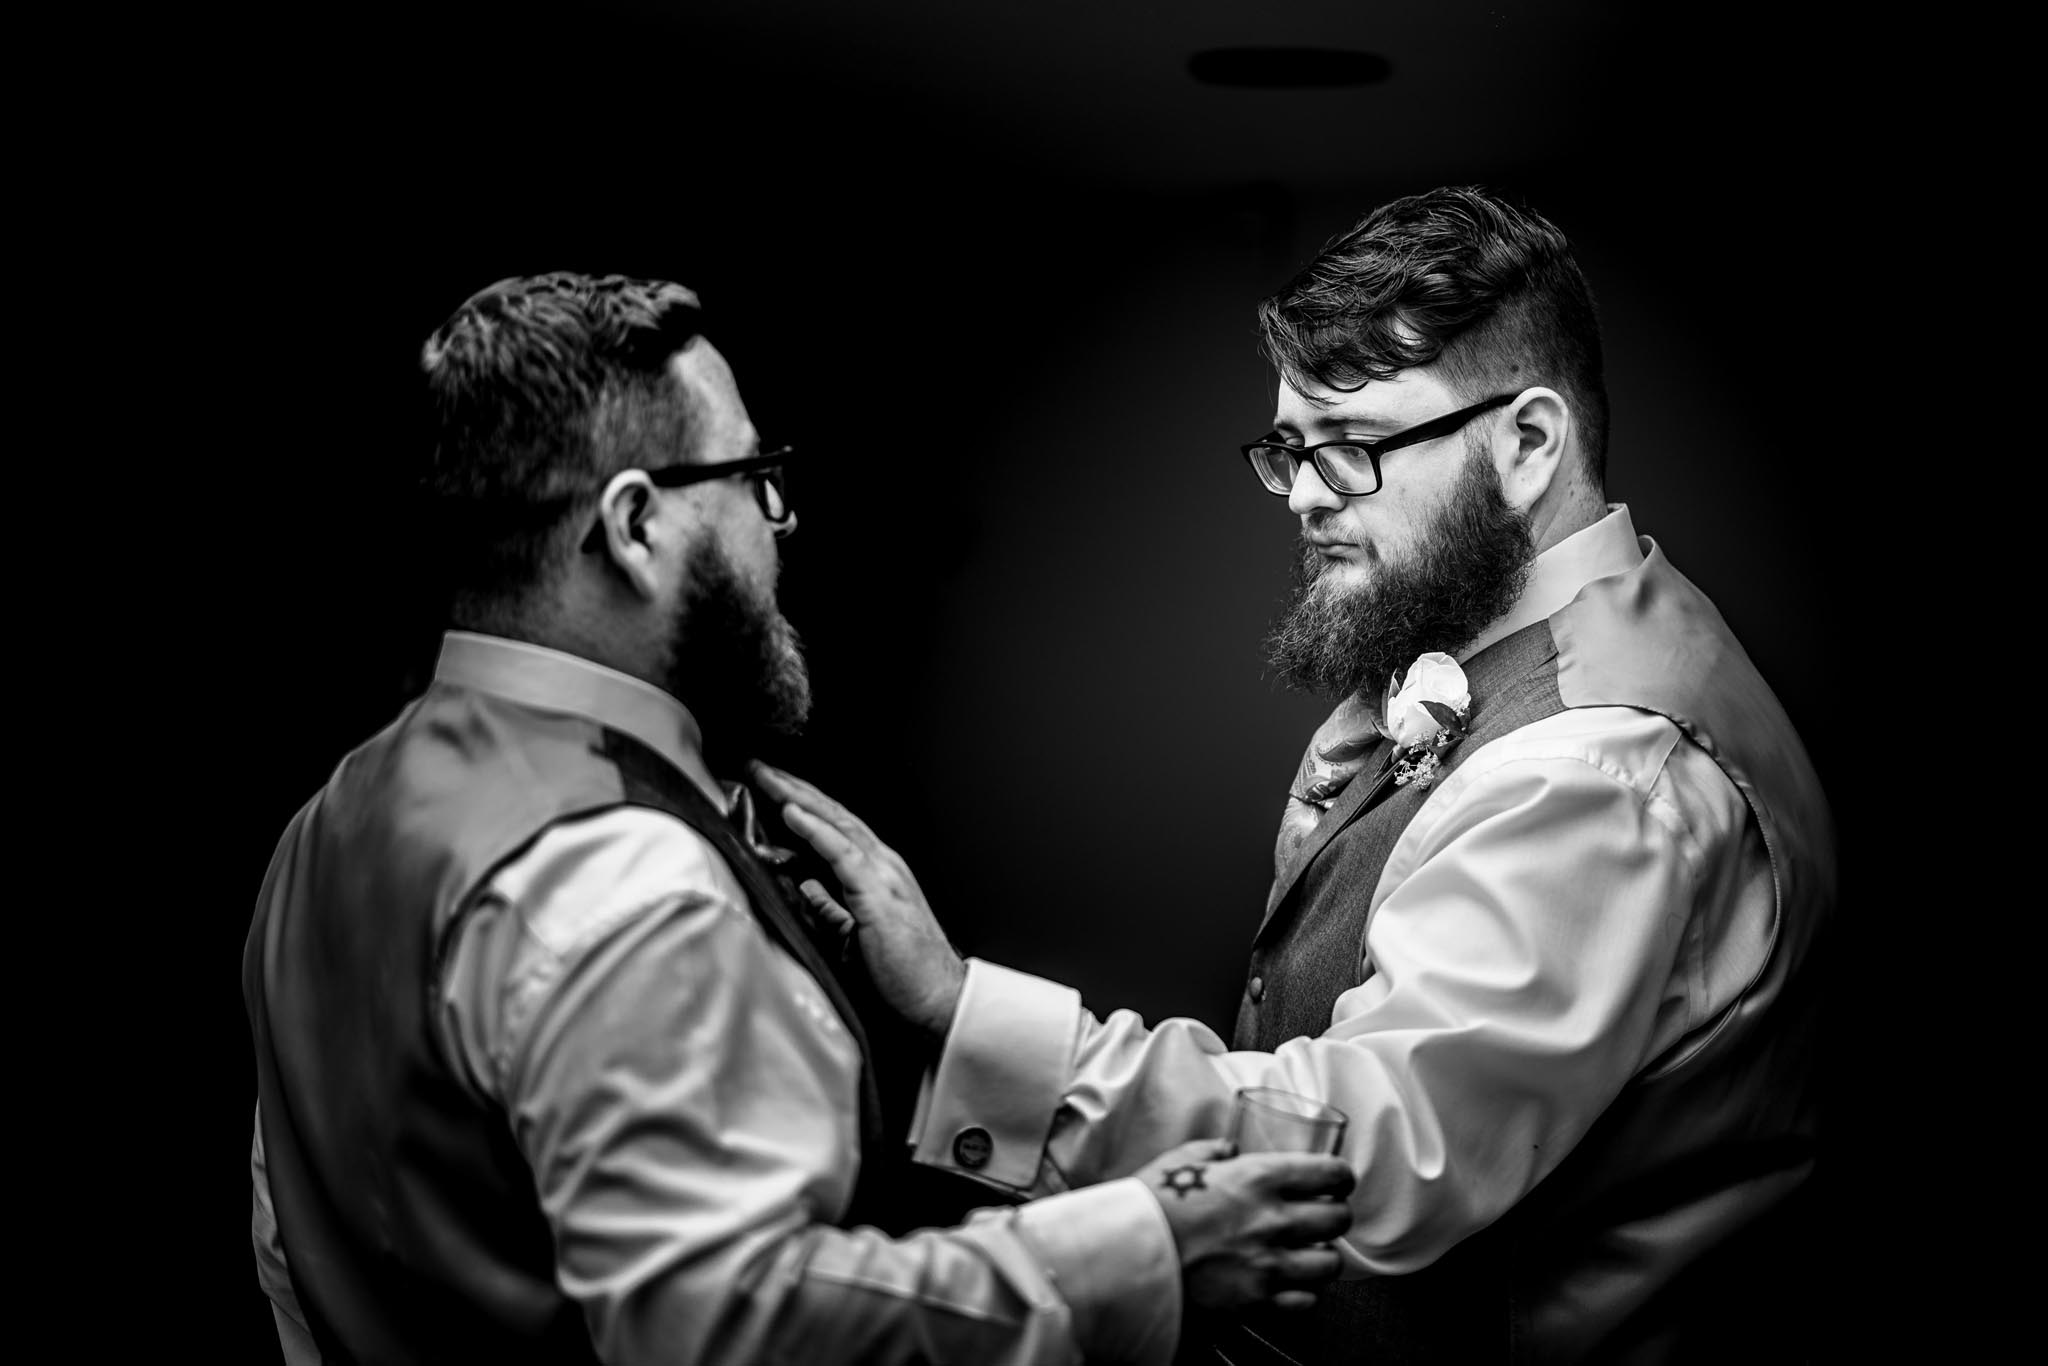 240-Arrivals-Luke-Yasmin-The-Rayleigh-Club-Wedding-Photography.jpg